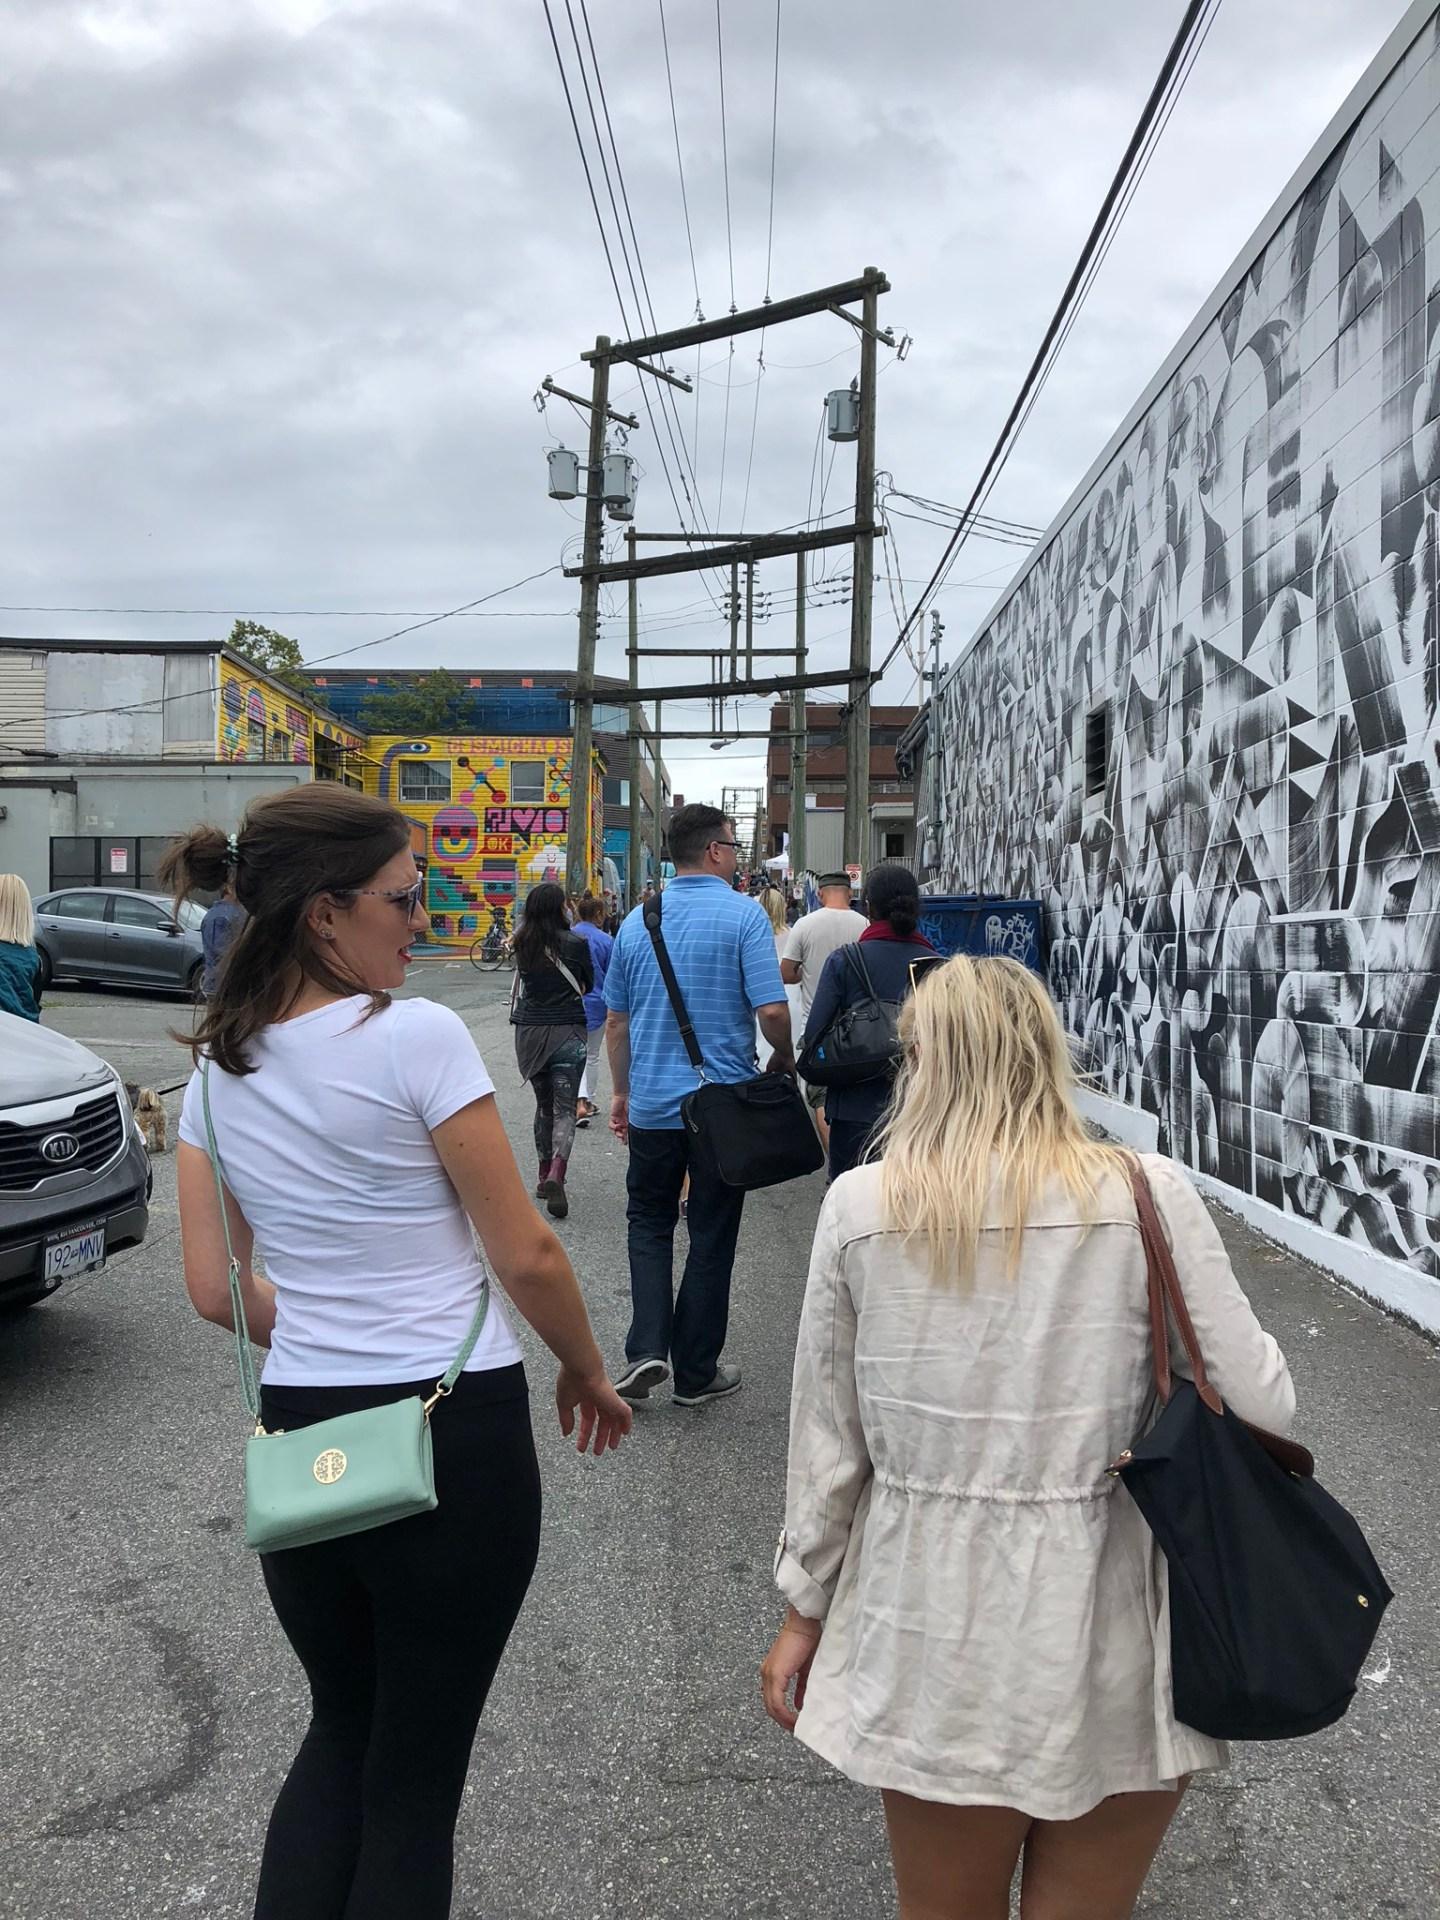 Girls at Vancouver Mural Festival